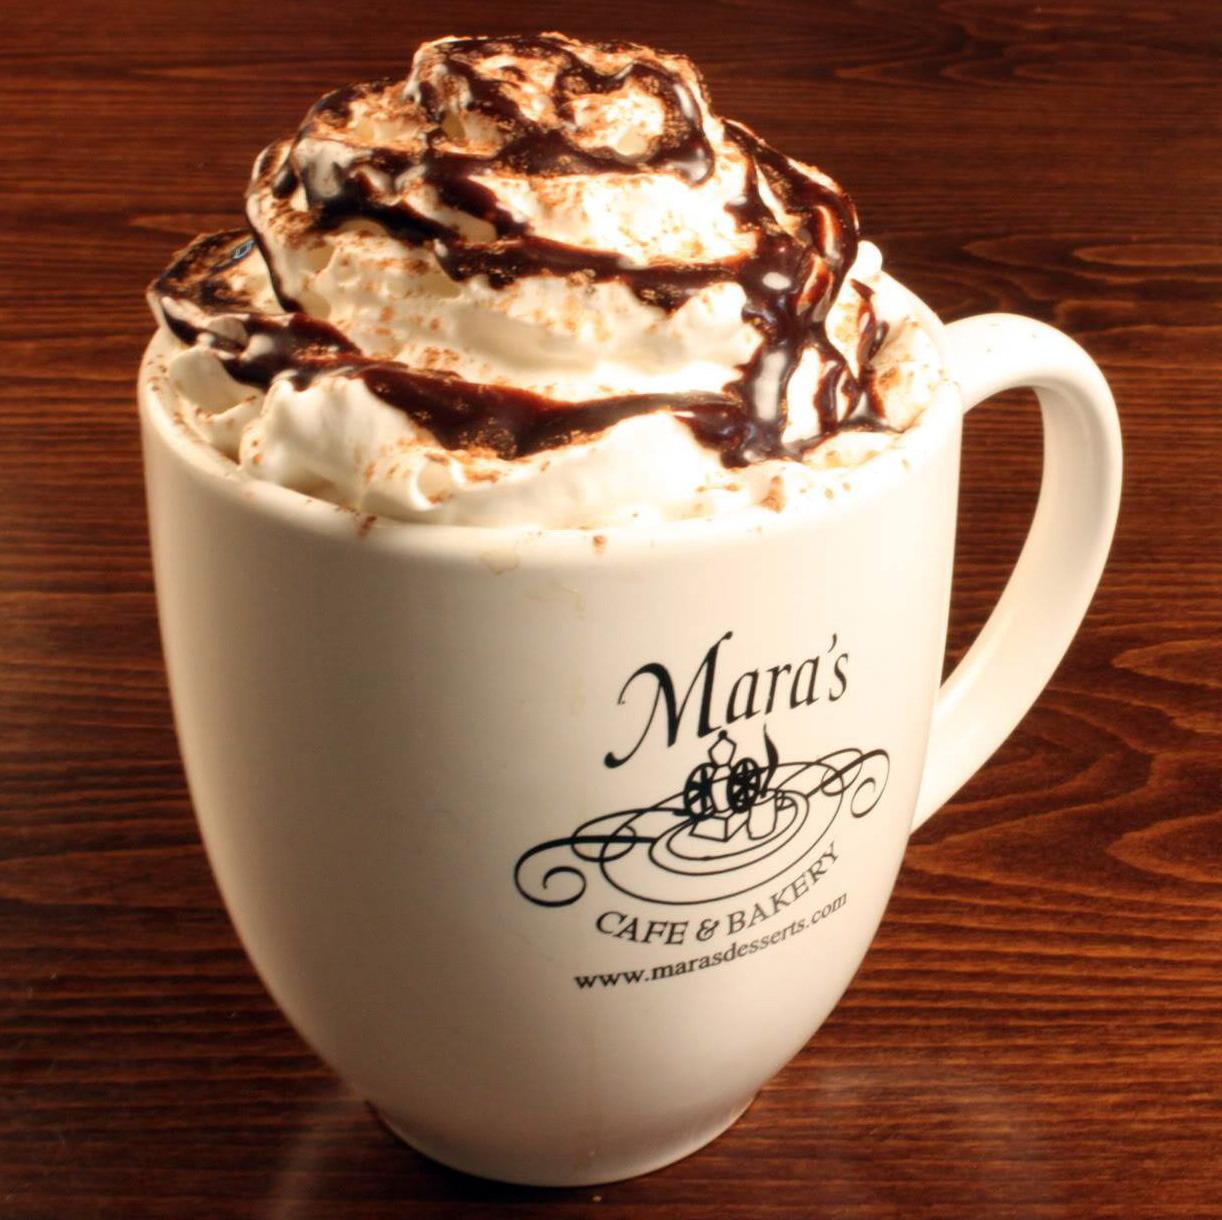 01a00f3a304995189f22_Mara_s_Coffee_Mug_Cappucino.jpg